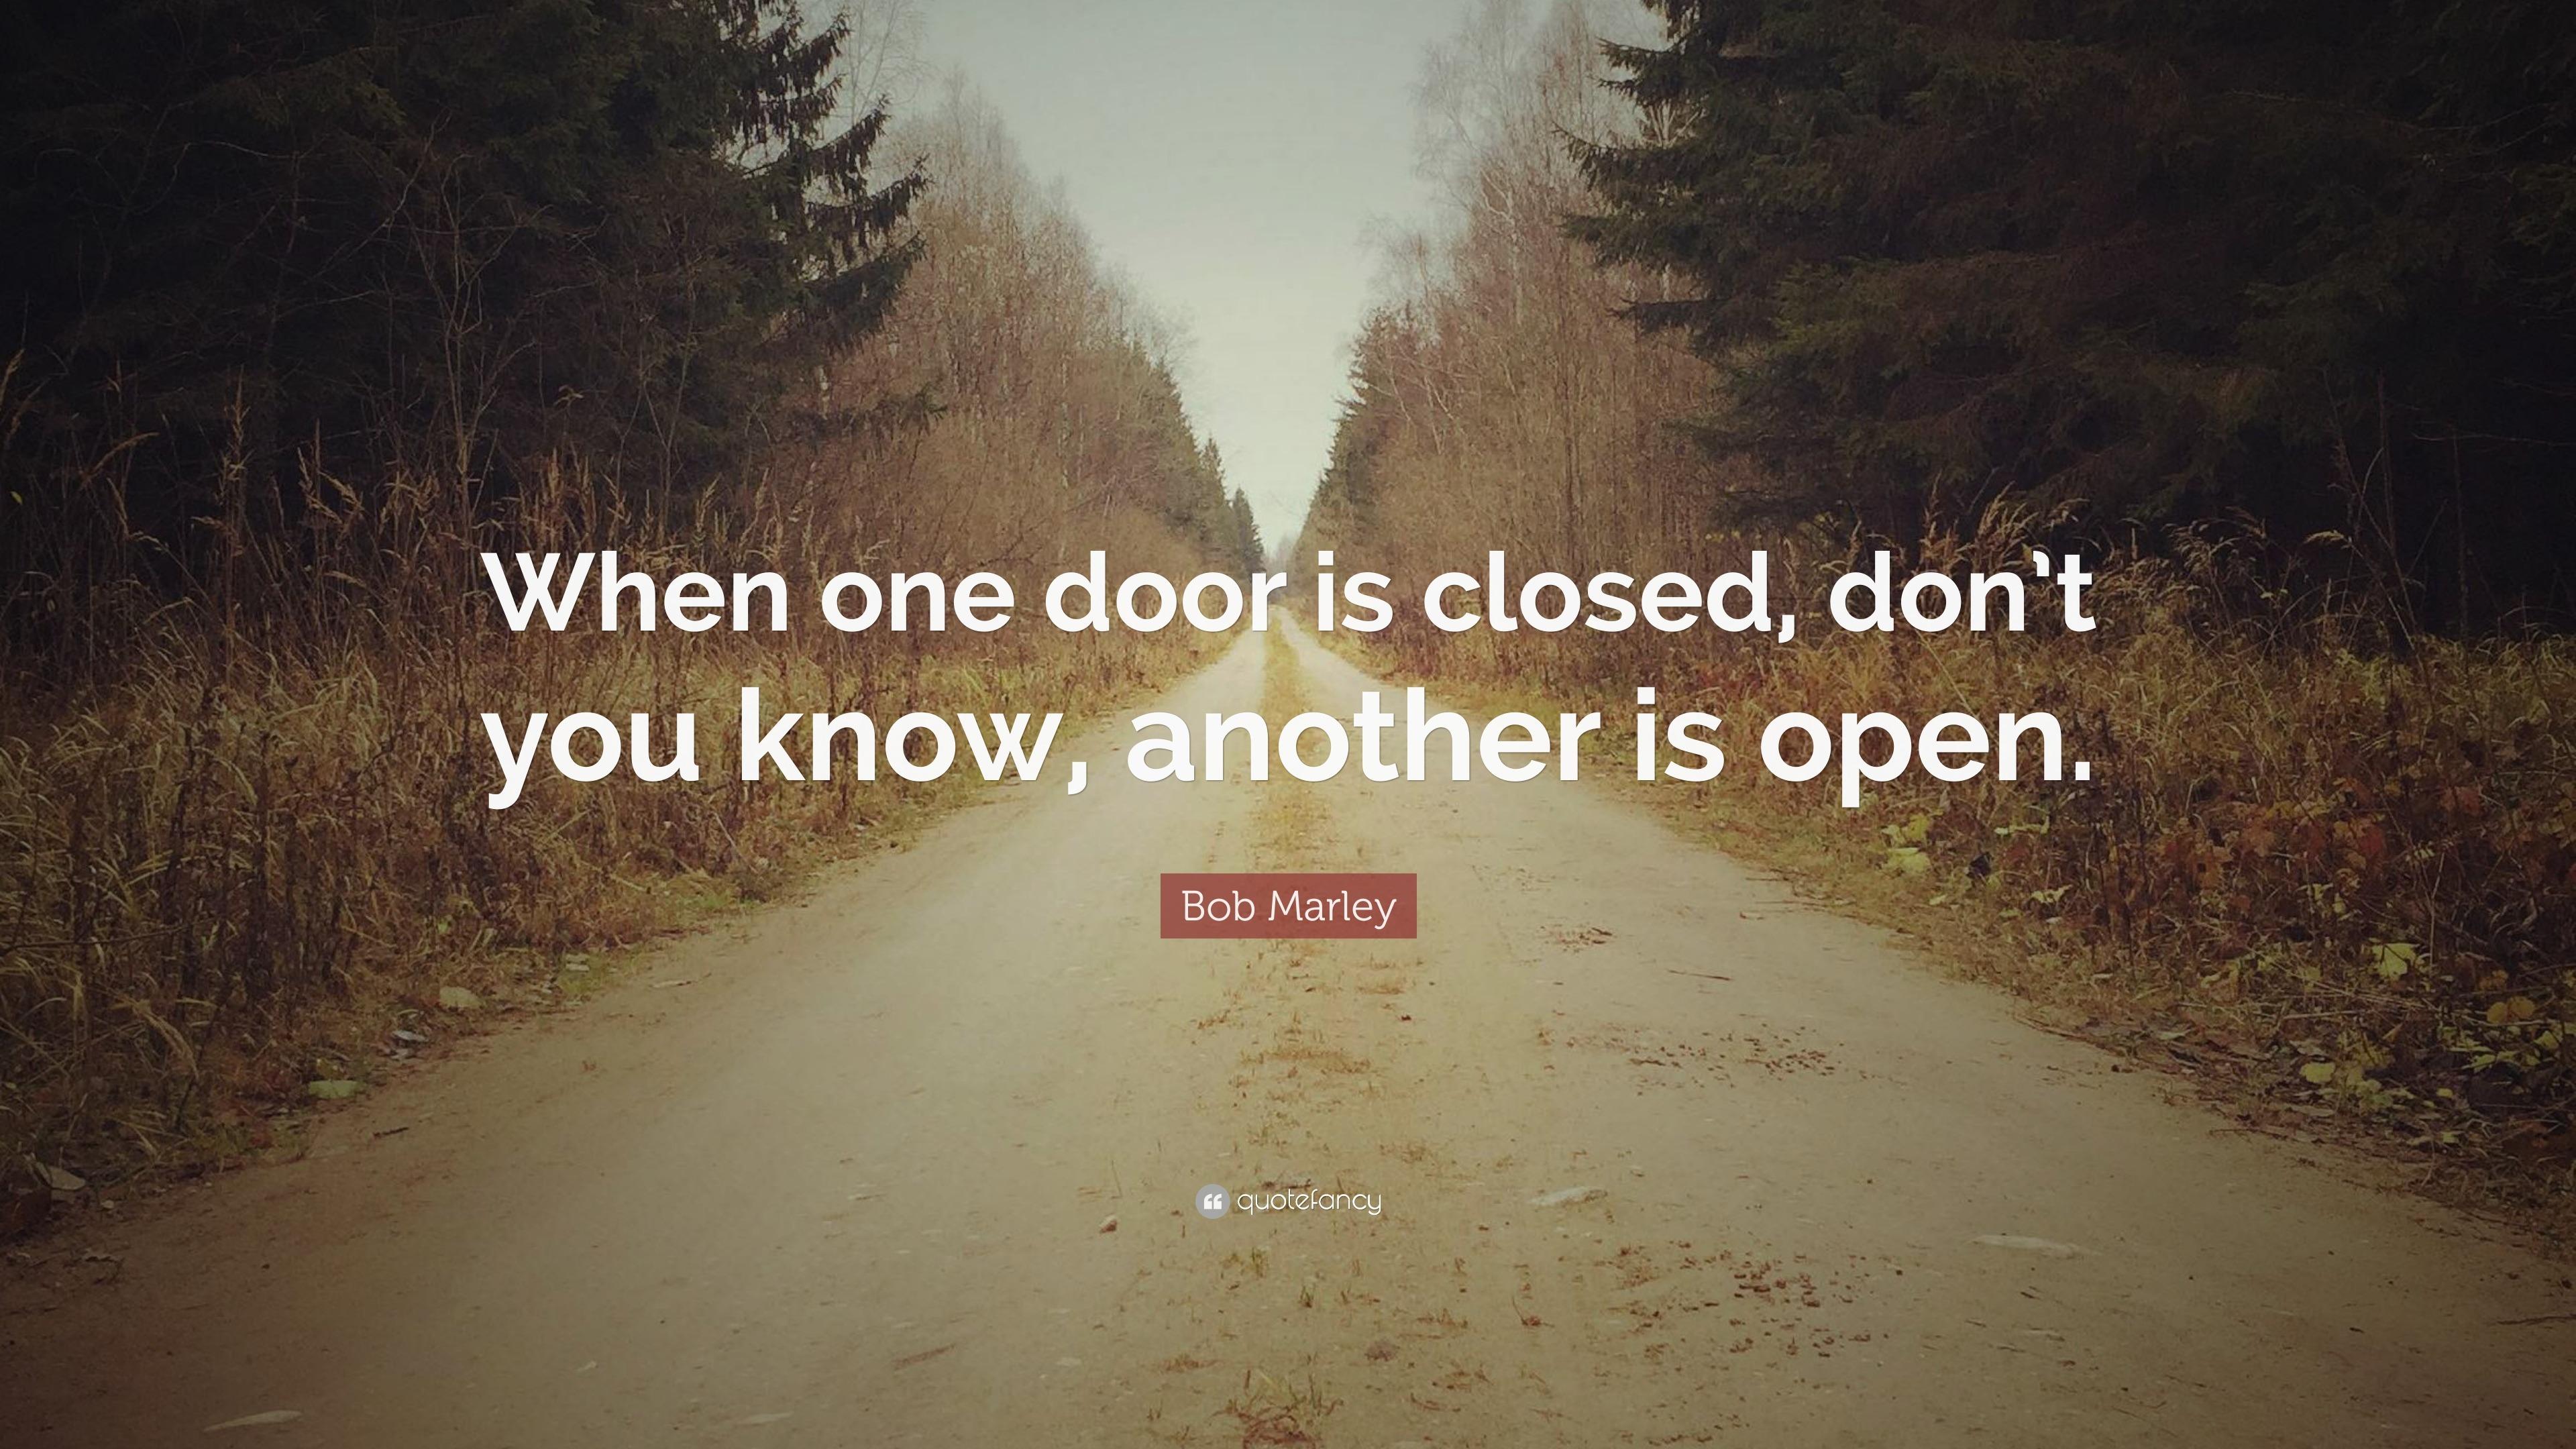 Bob Marley Quote u201cWhen one door is closed donu0027t you know & Bob Marley Quote: u201cWhen one door is closed donu0027t you know another ...